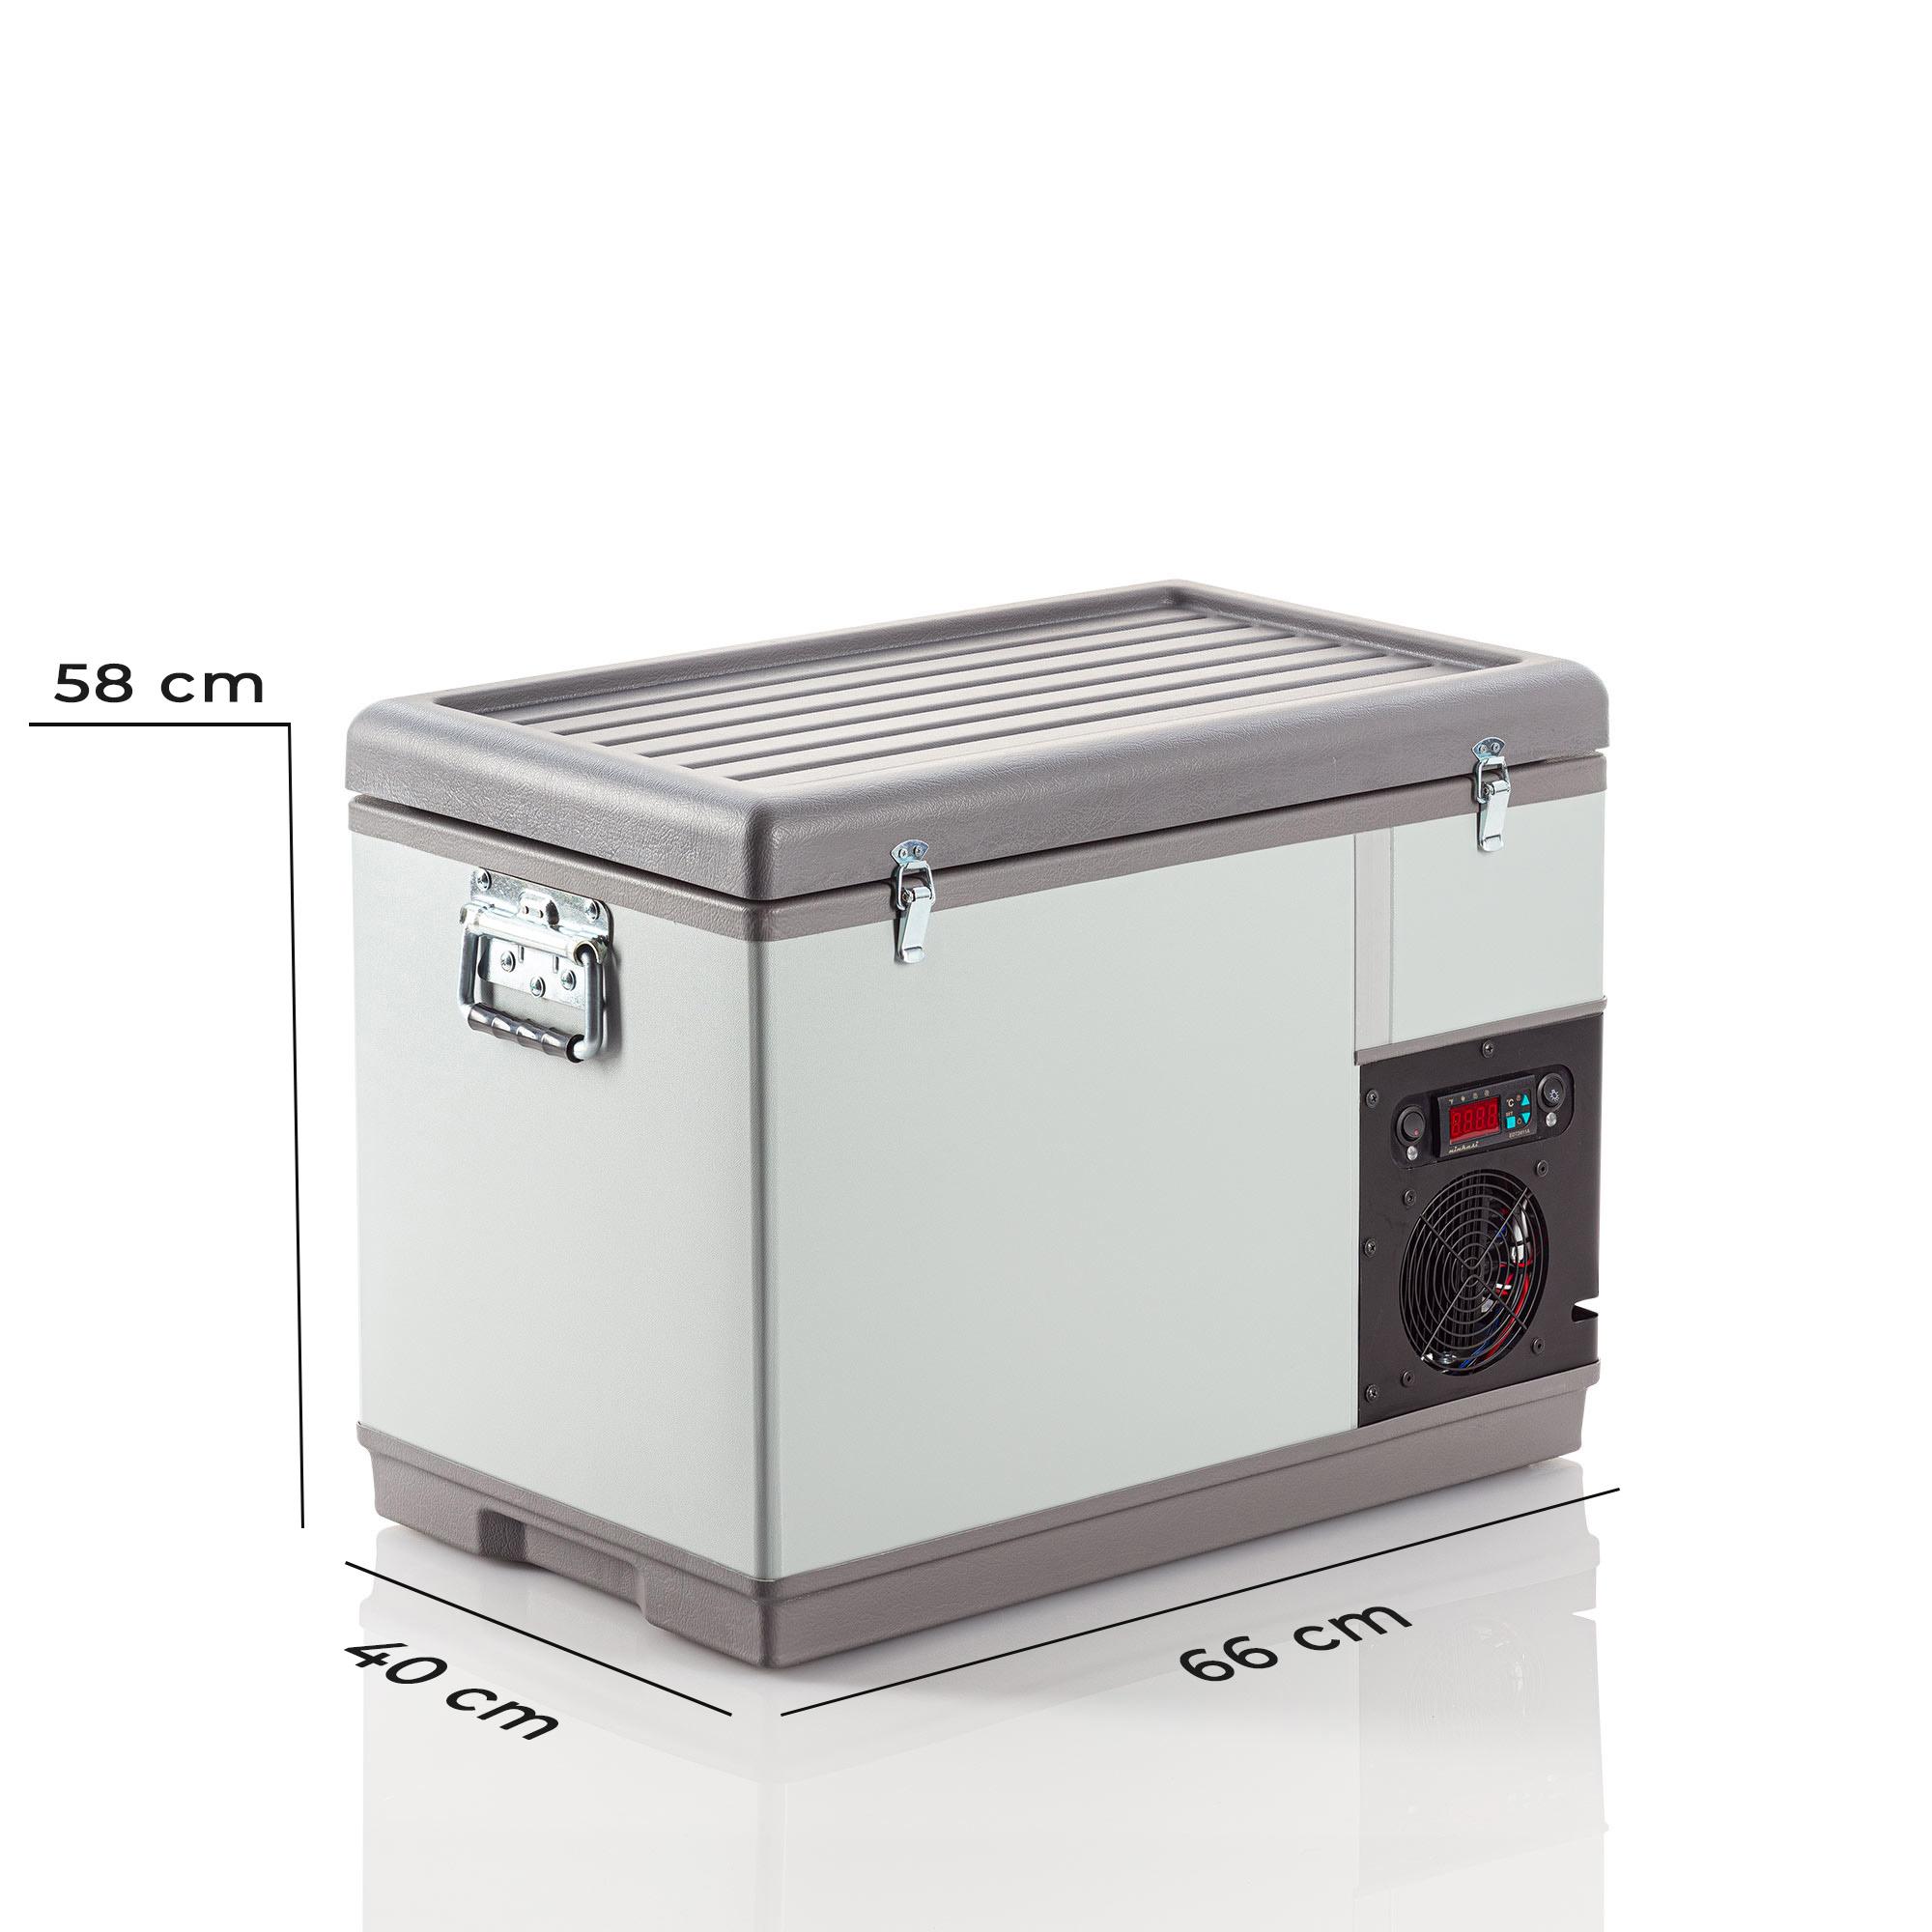 MET 3856 COMBI 53 LT Soğutucu Araç Buzdolabı